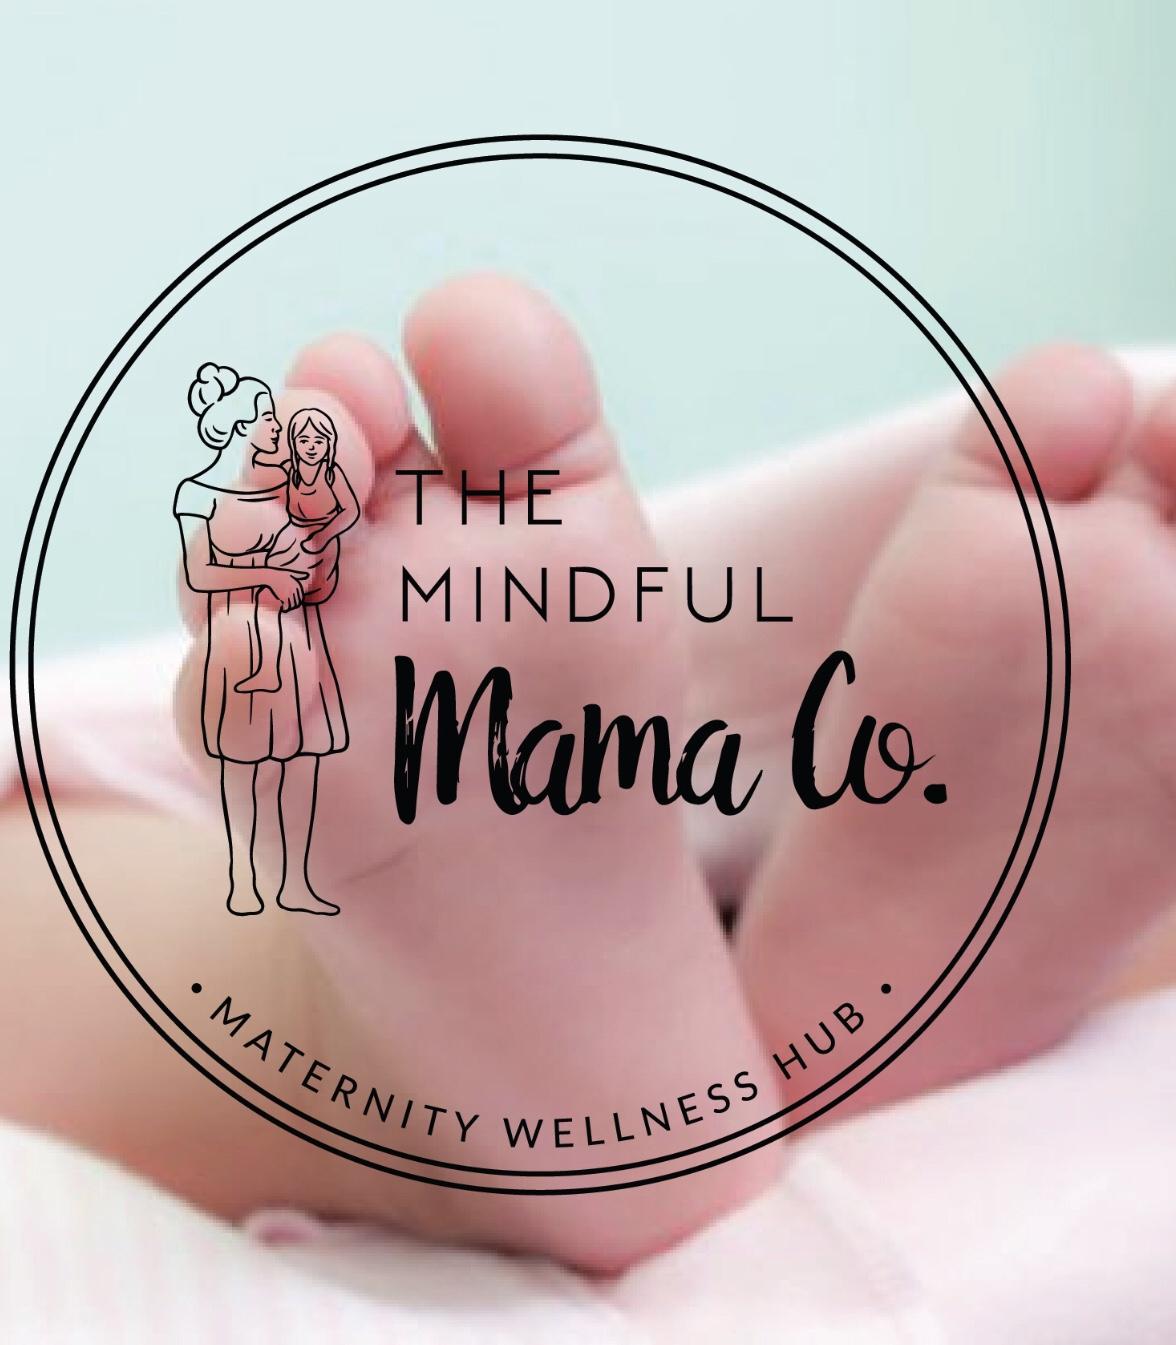 The Mindful Mama Co.